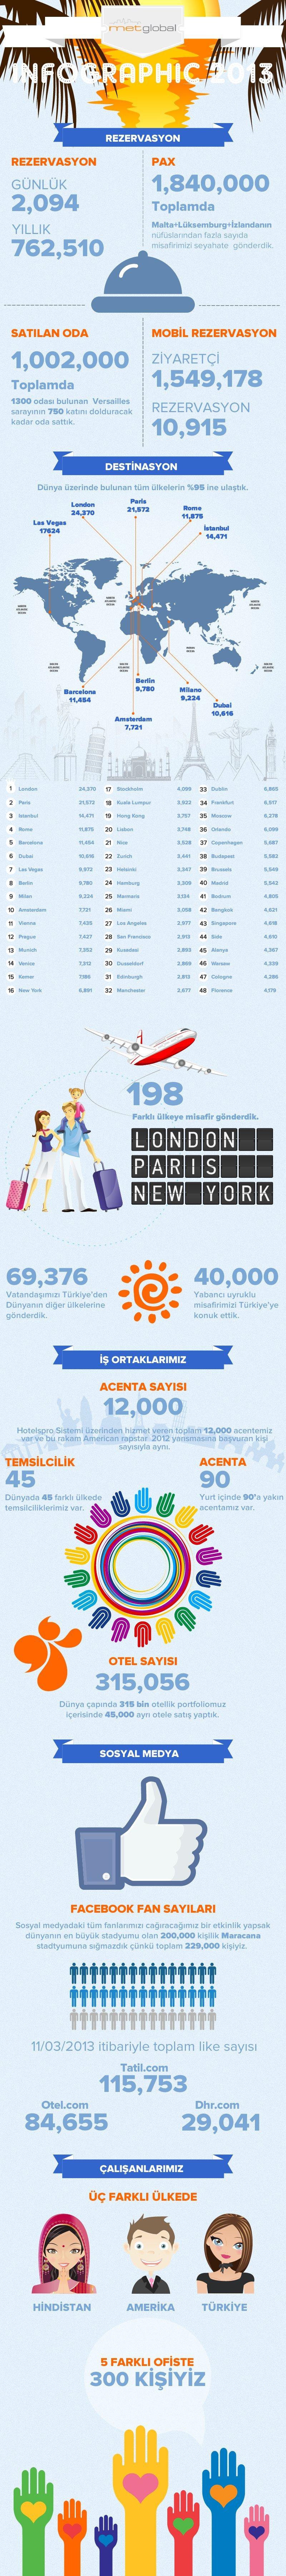 metglobal-infografik-2012